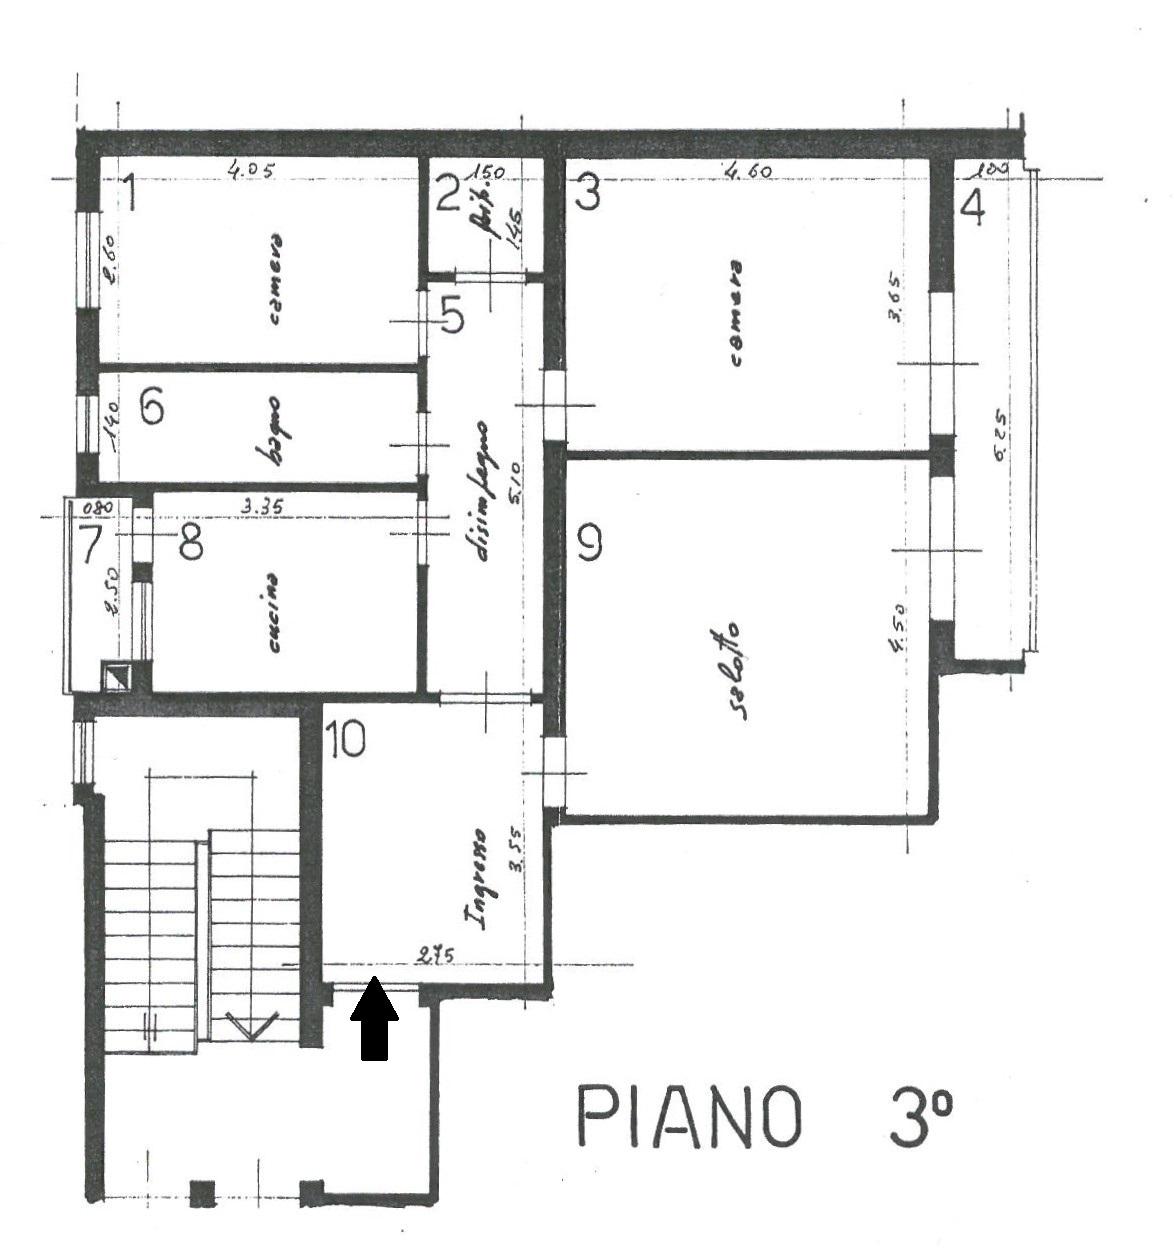 Appartamento in vendita, rif. K152 (Planimetria 1/1)